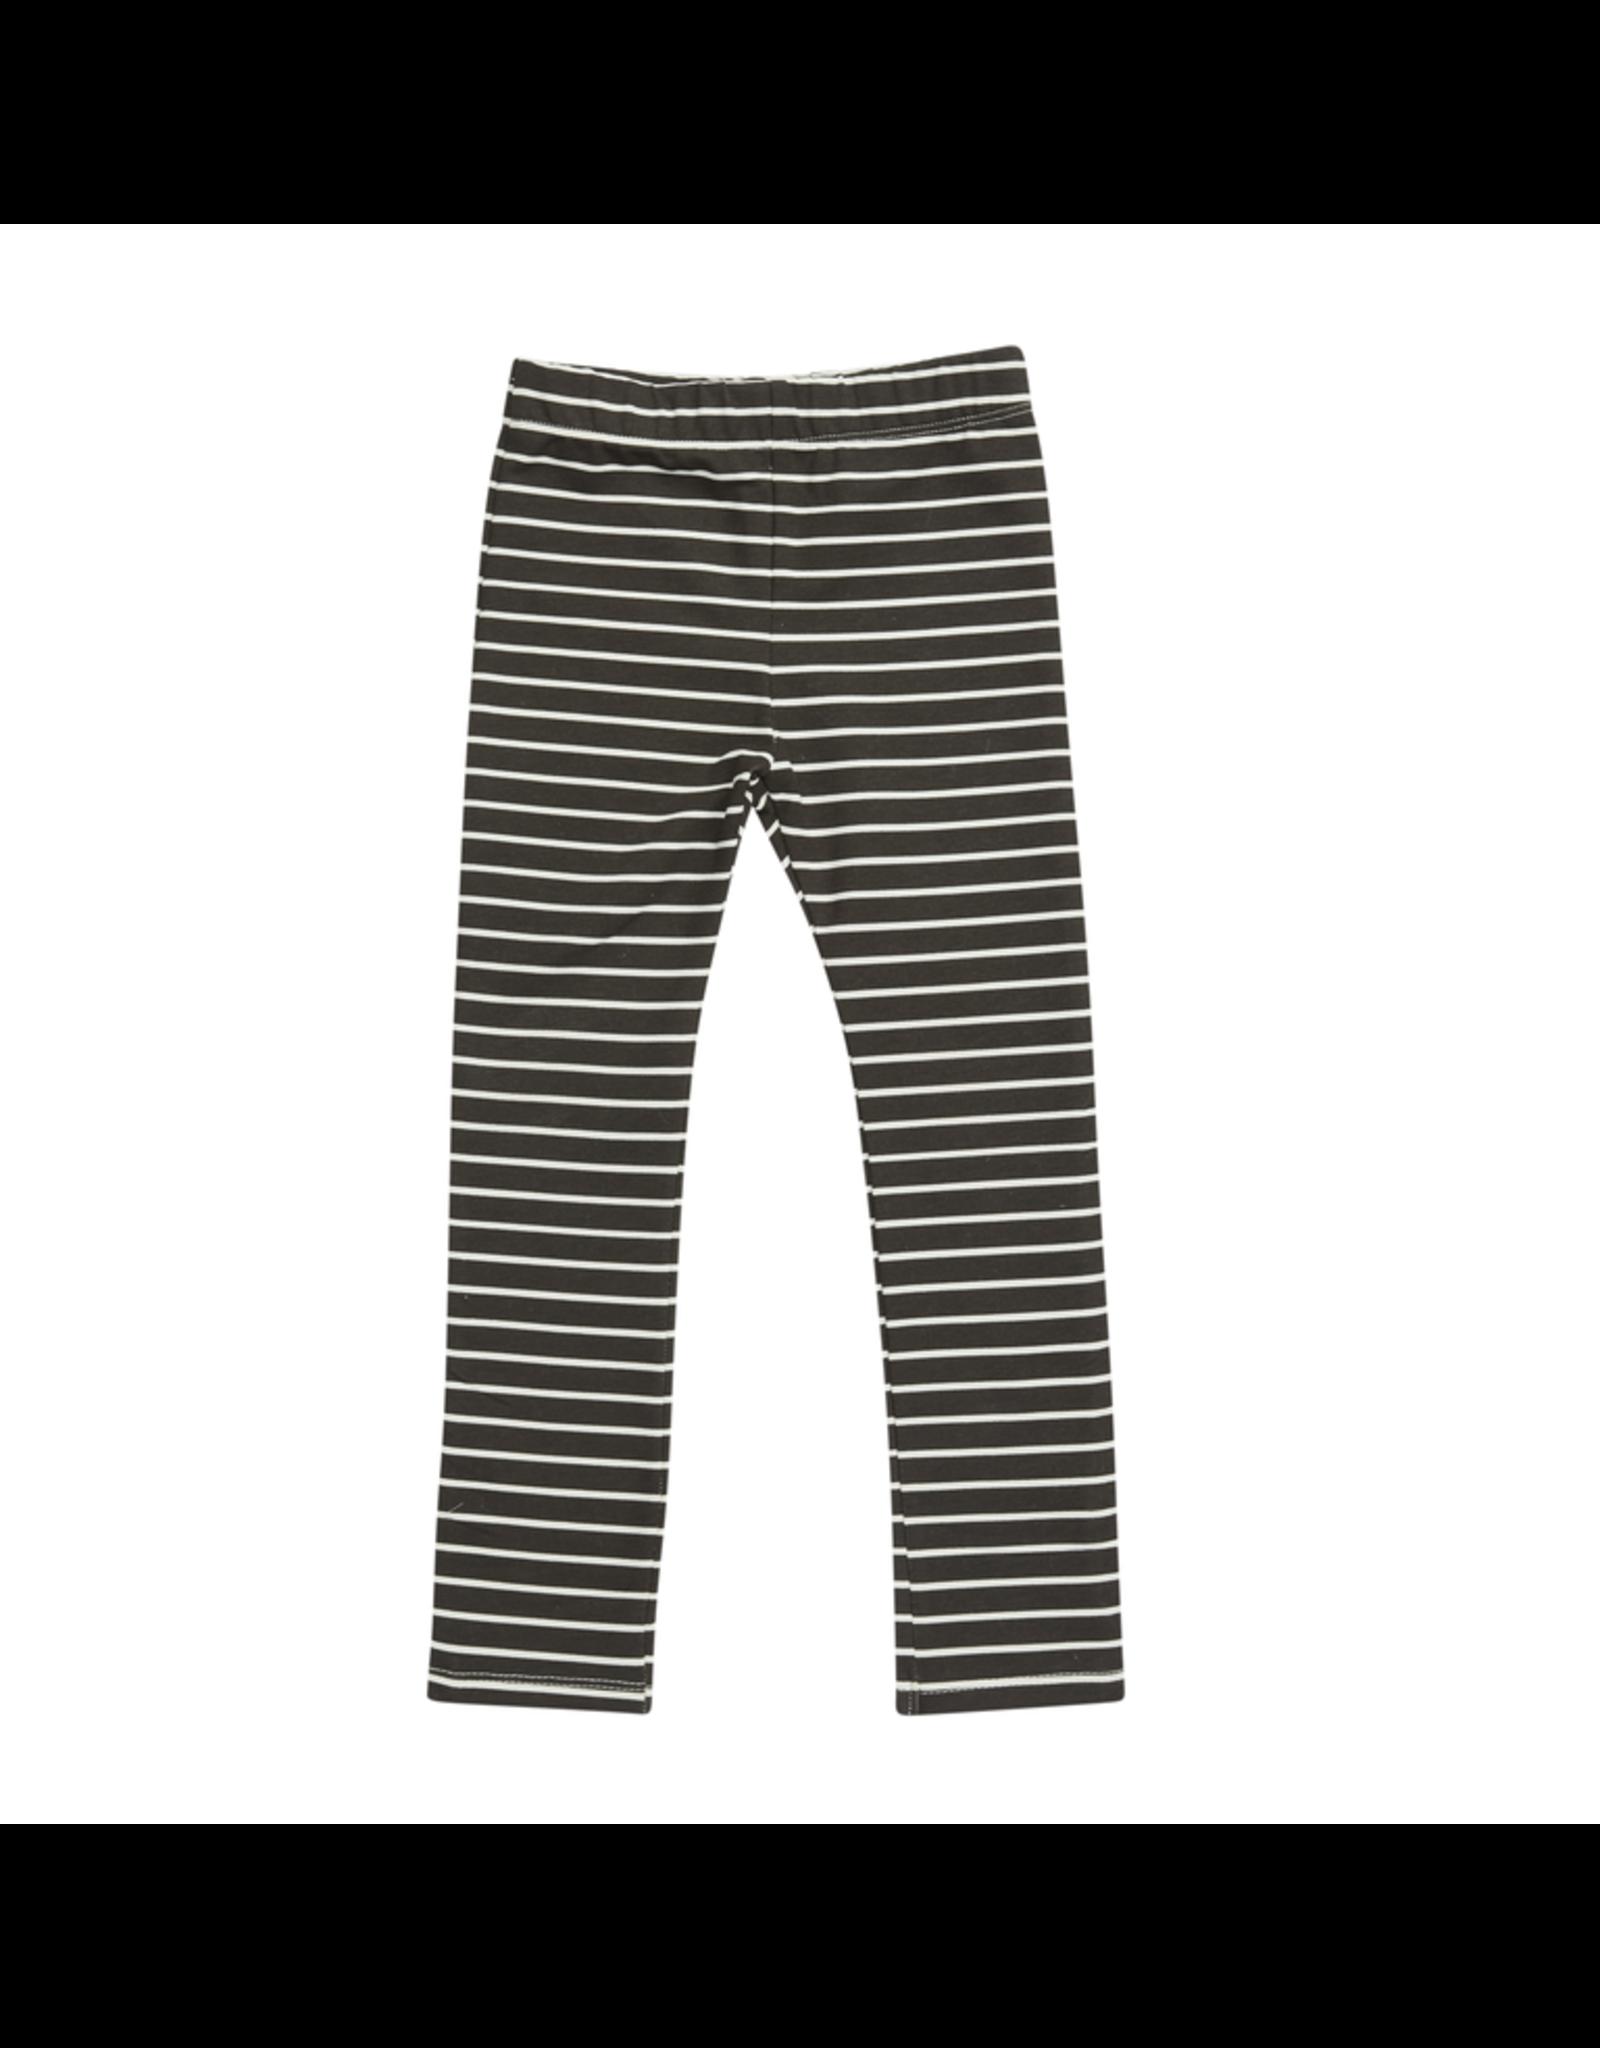 Blossom Kids Legging, Petit Stripes, Espresso Black